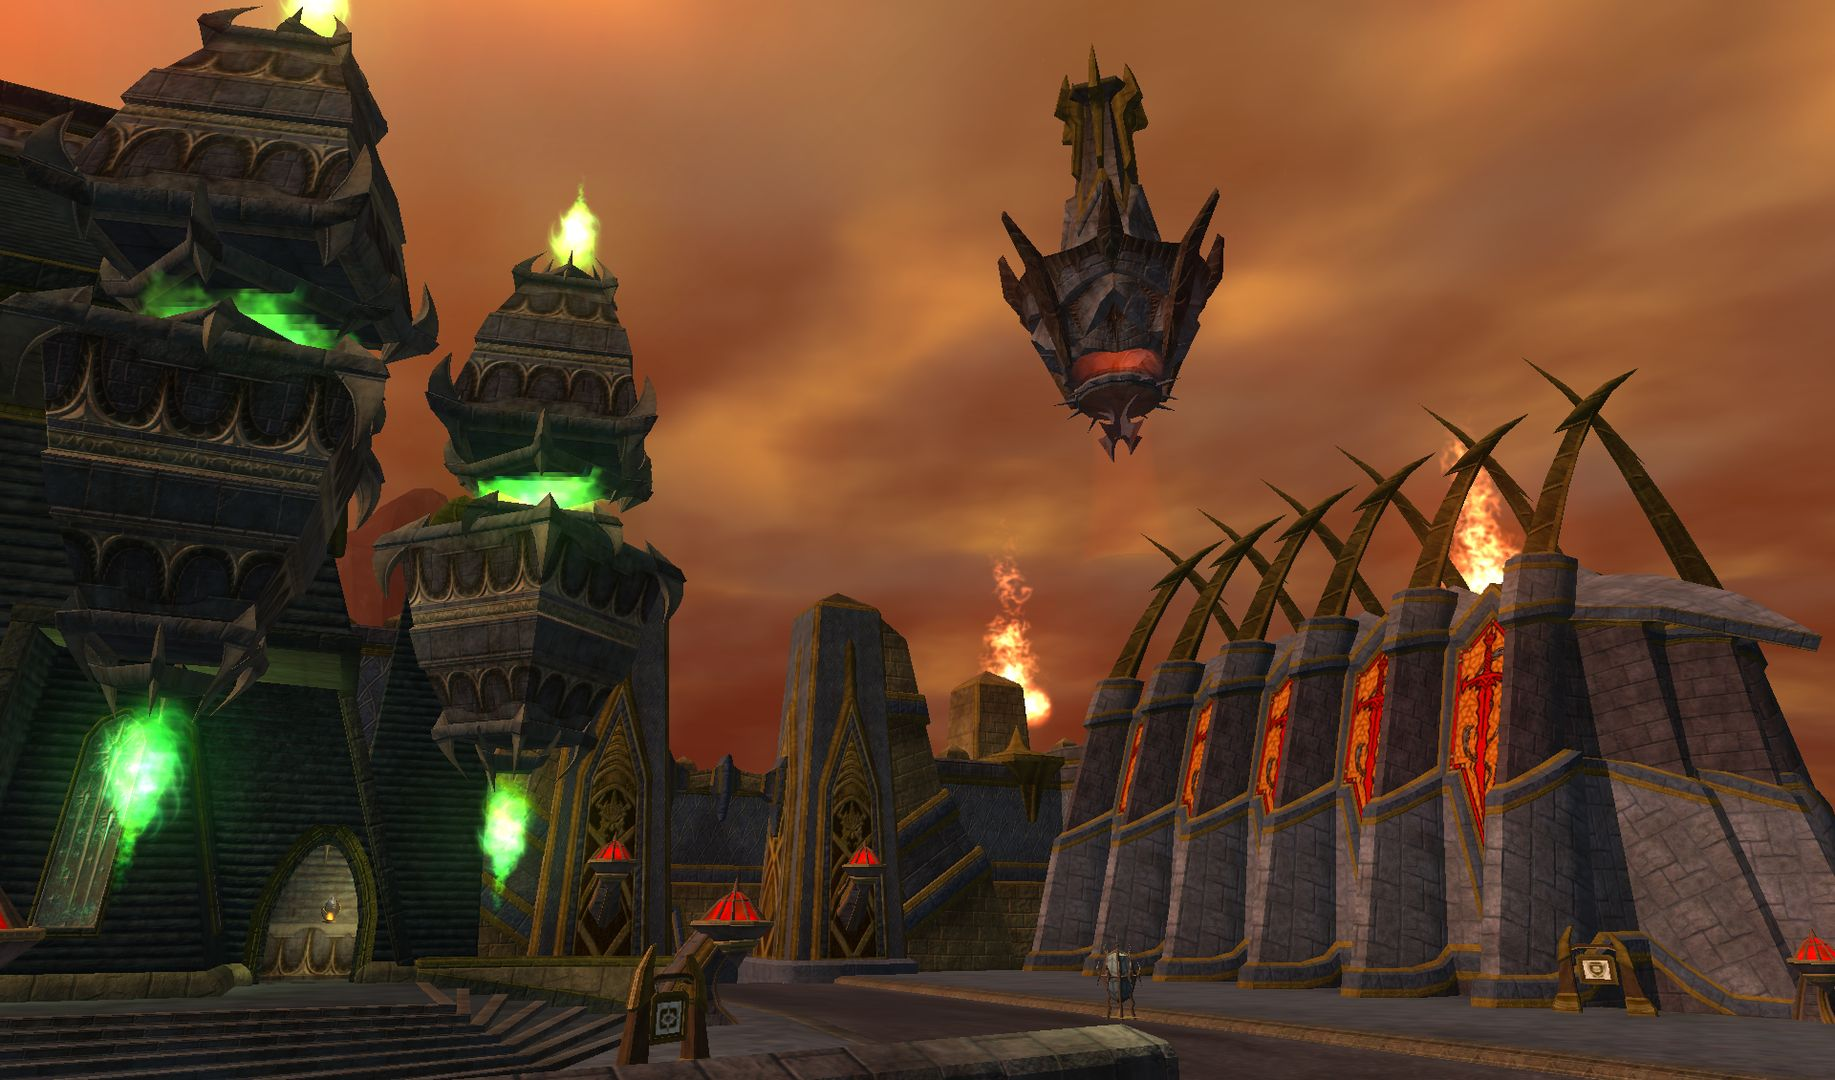 EverQuest II Fiyat Karşılaştırma